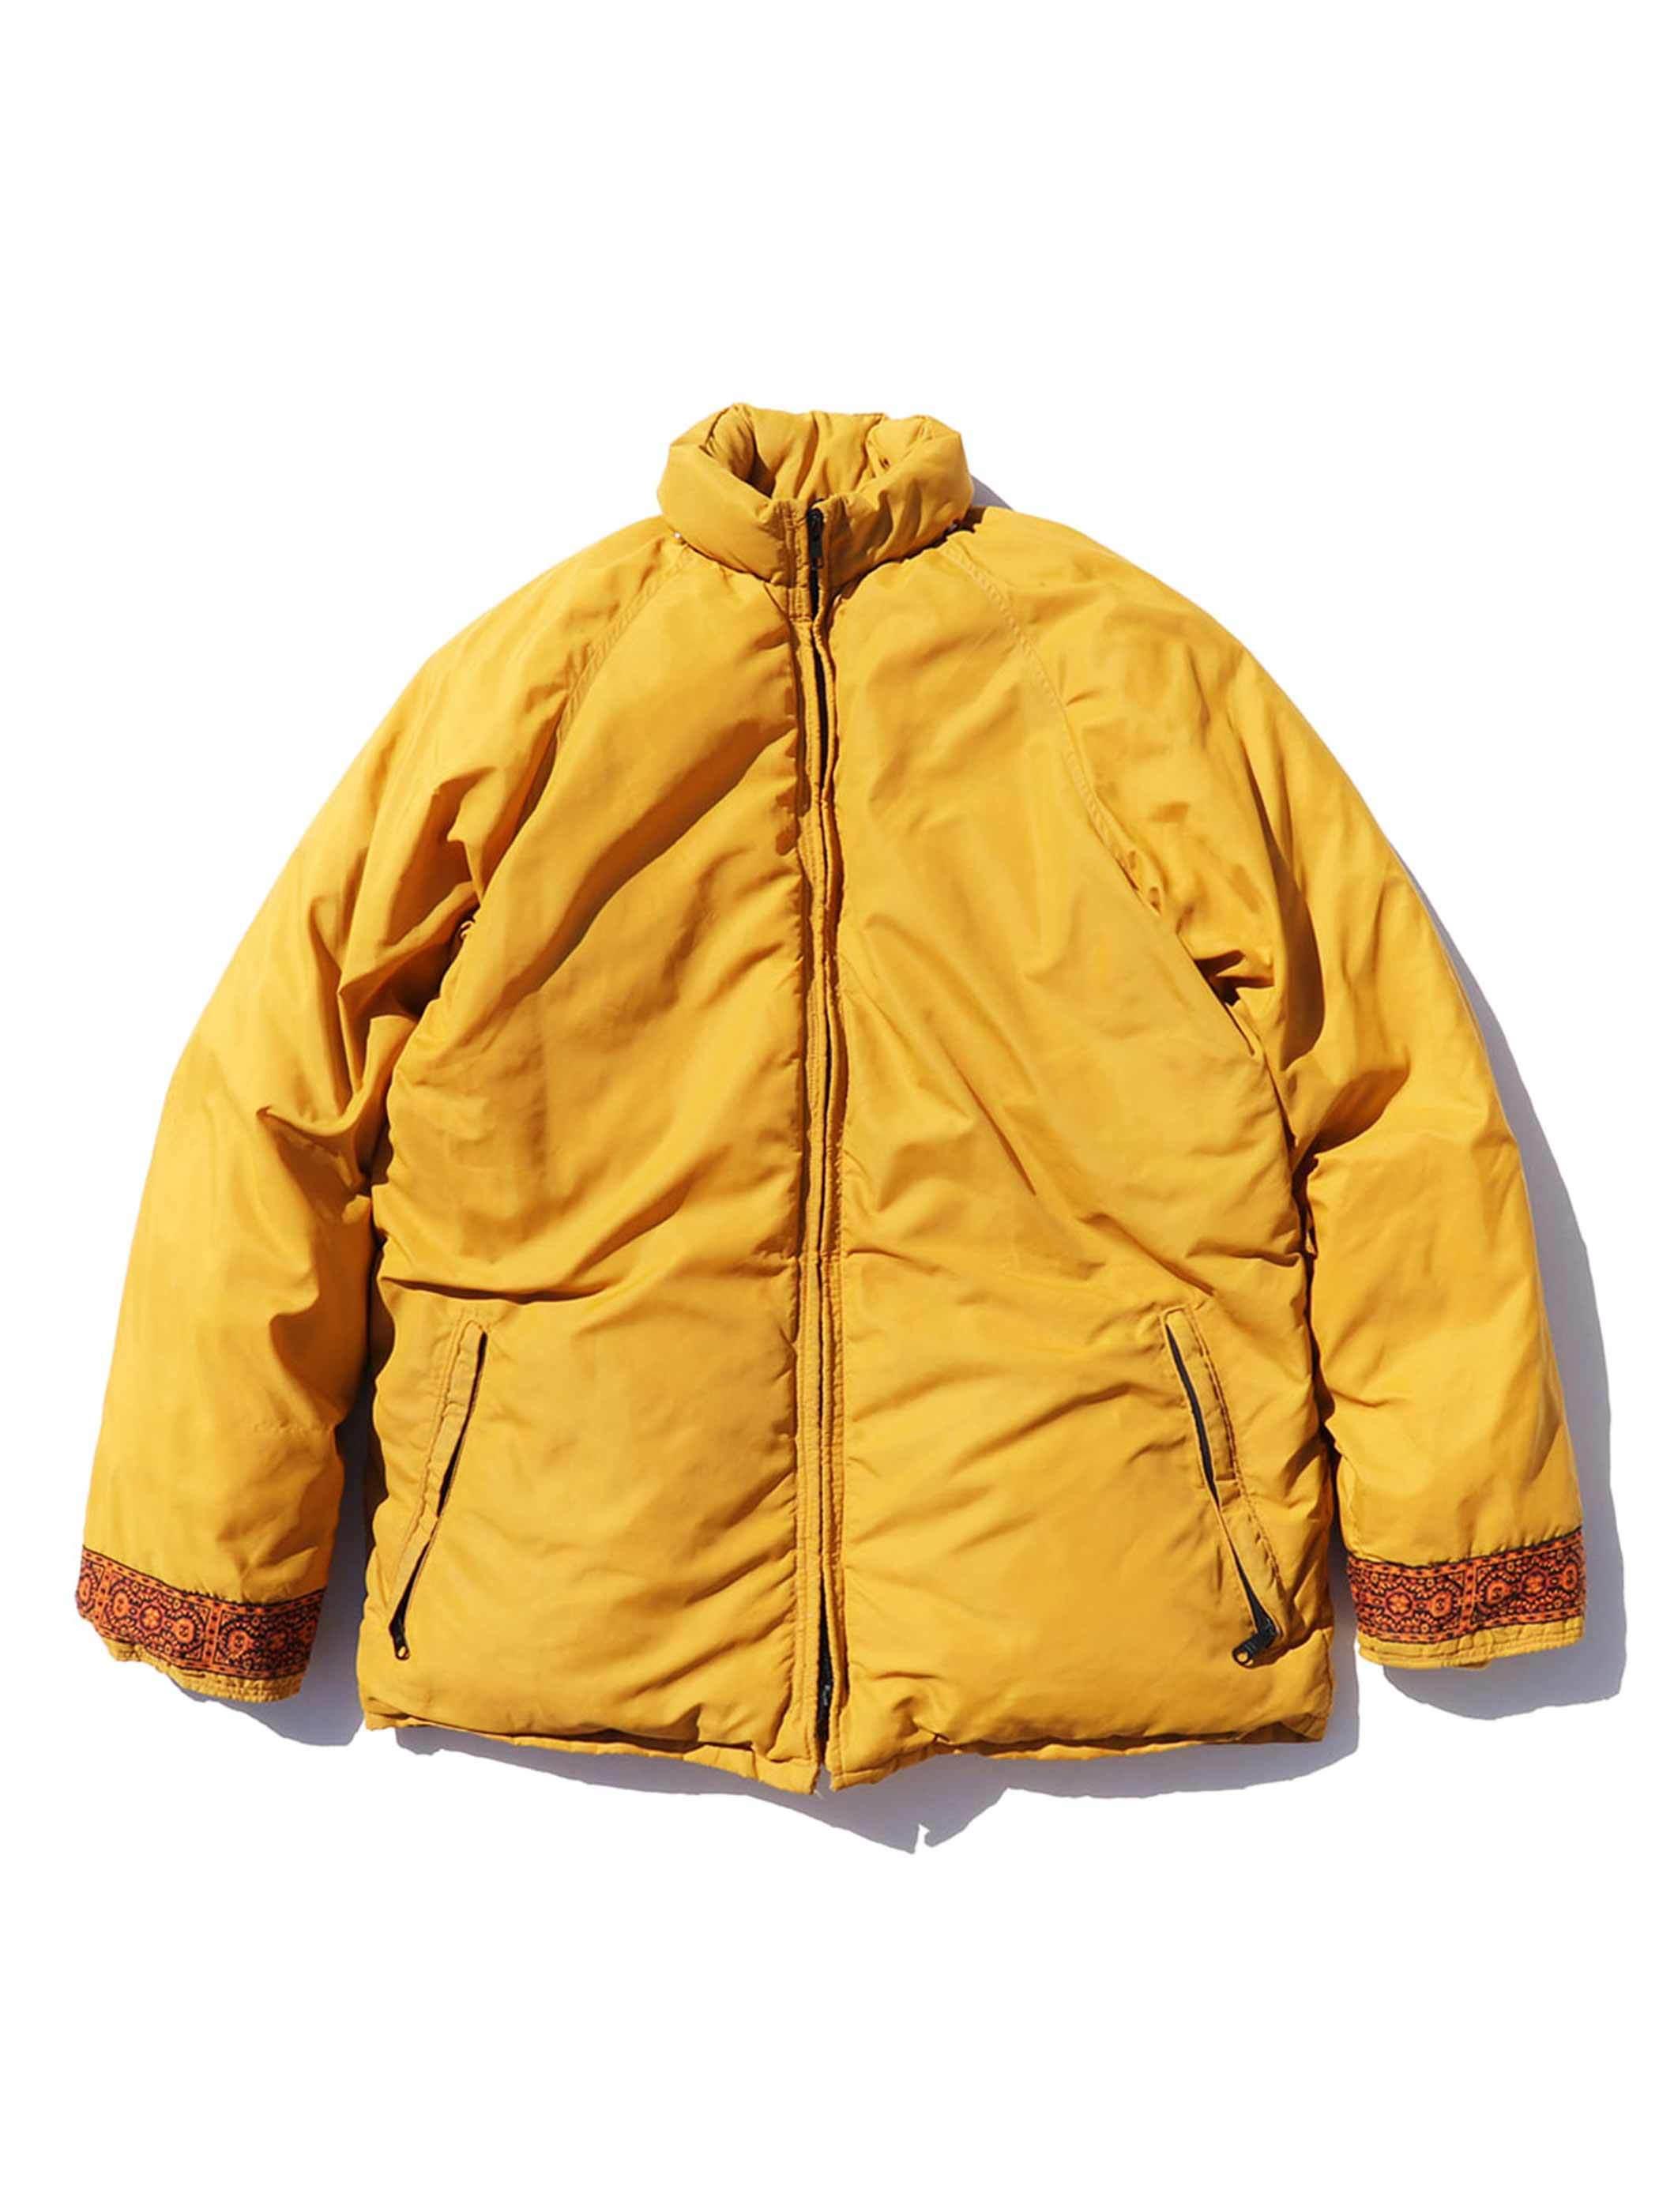 70's~ UNKNOWN Non-Stitch Mustard Down Jacket [About L]